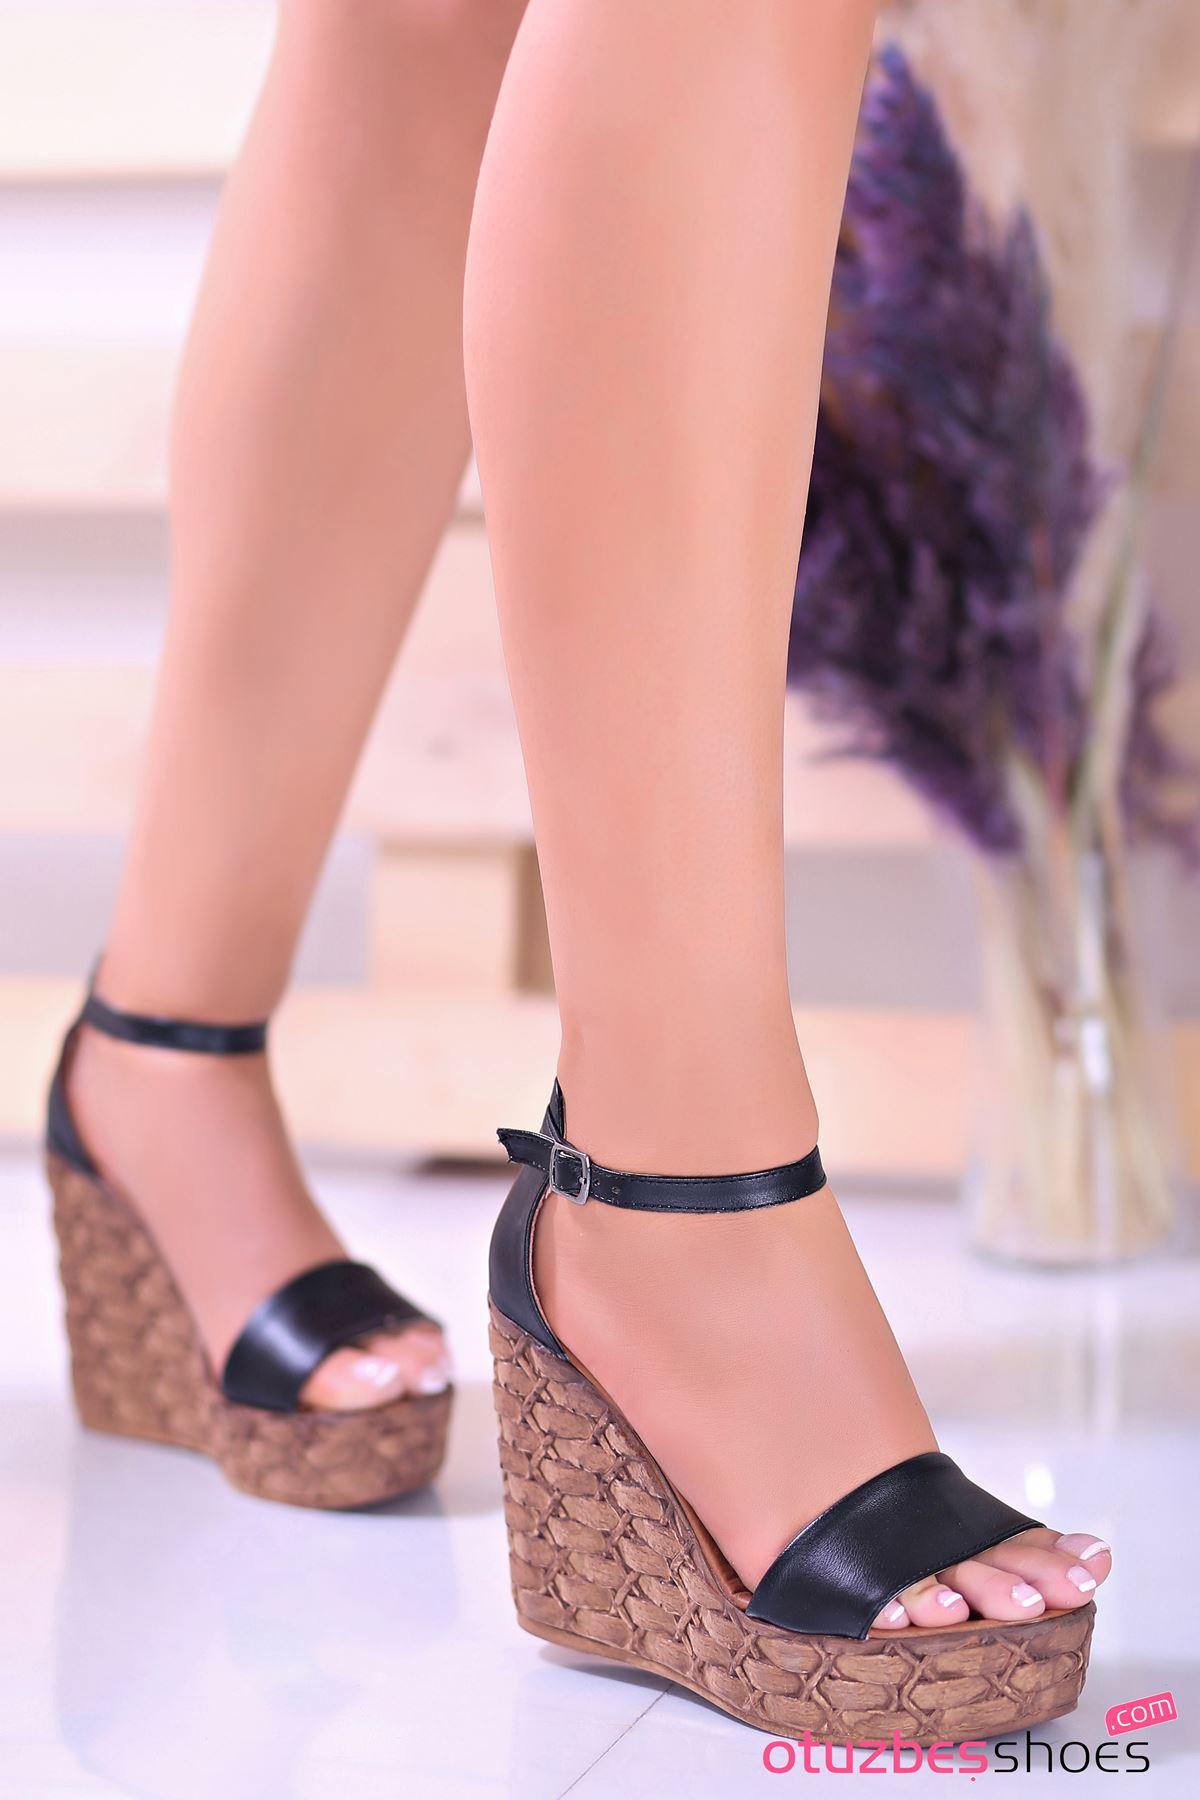 For You Siyah Dolgu Topuk Kadın Ayakkabı